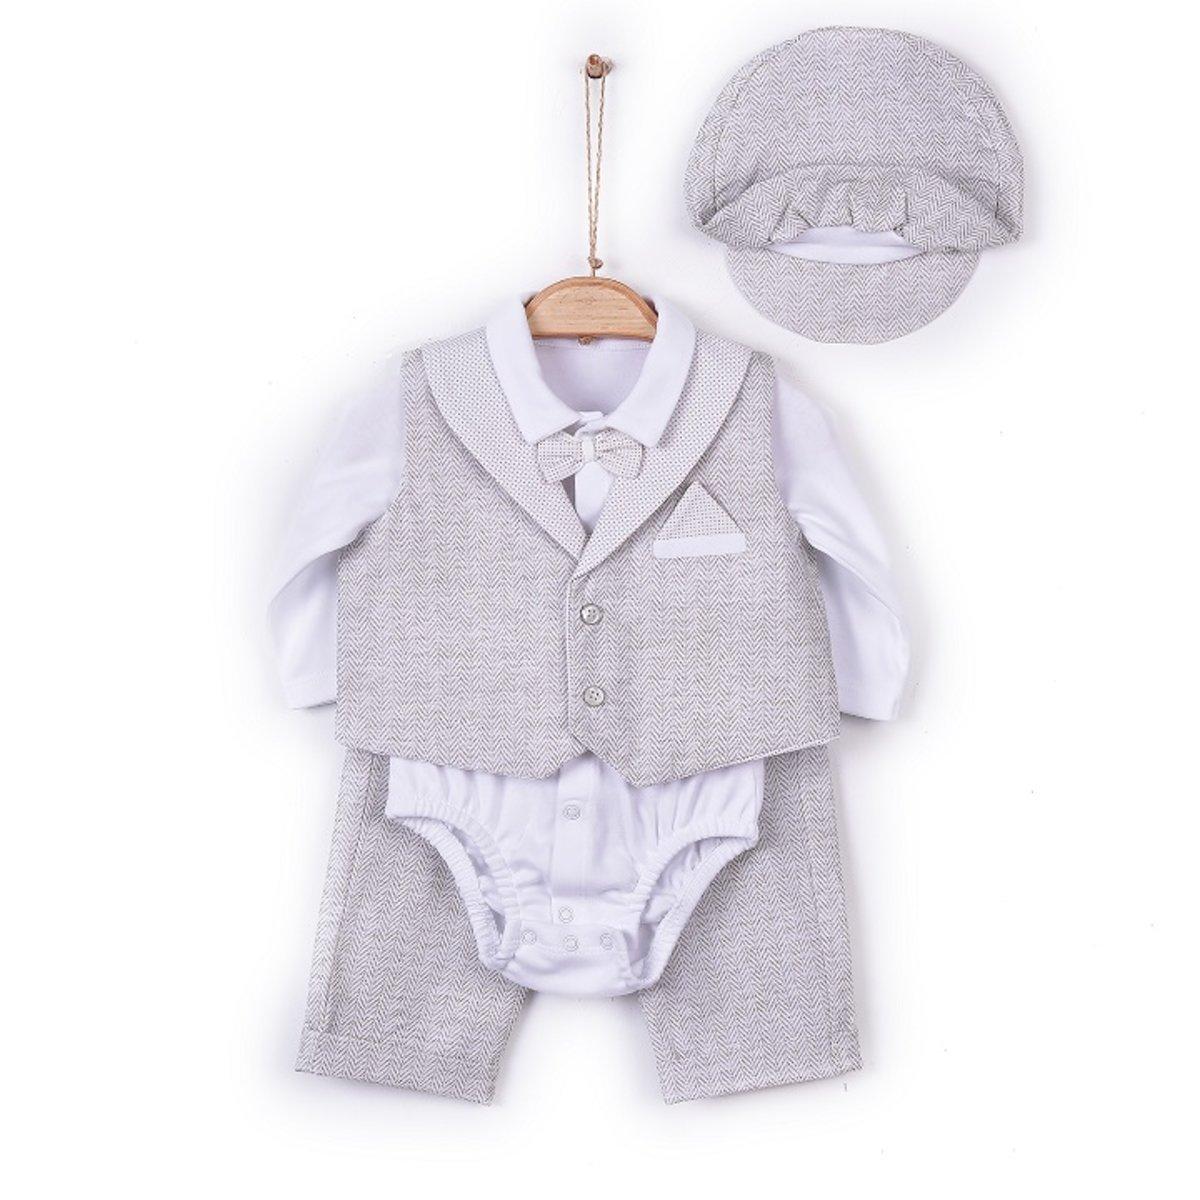 Organic Boy Suit (Shirt+Trousers+Cap) (ERKEK MEVLUT TAKIMI)-1-3M